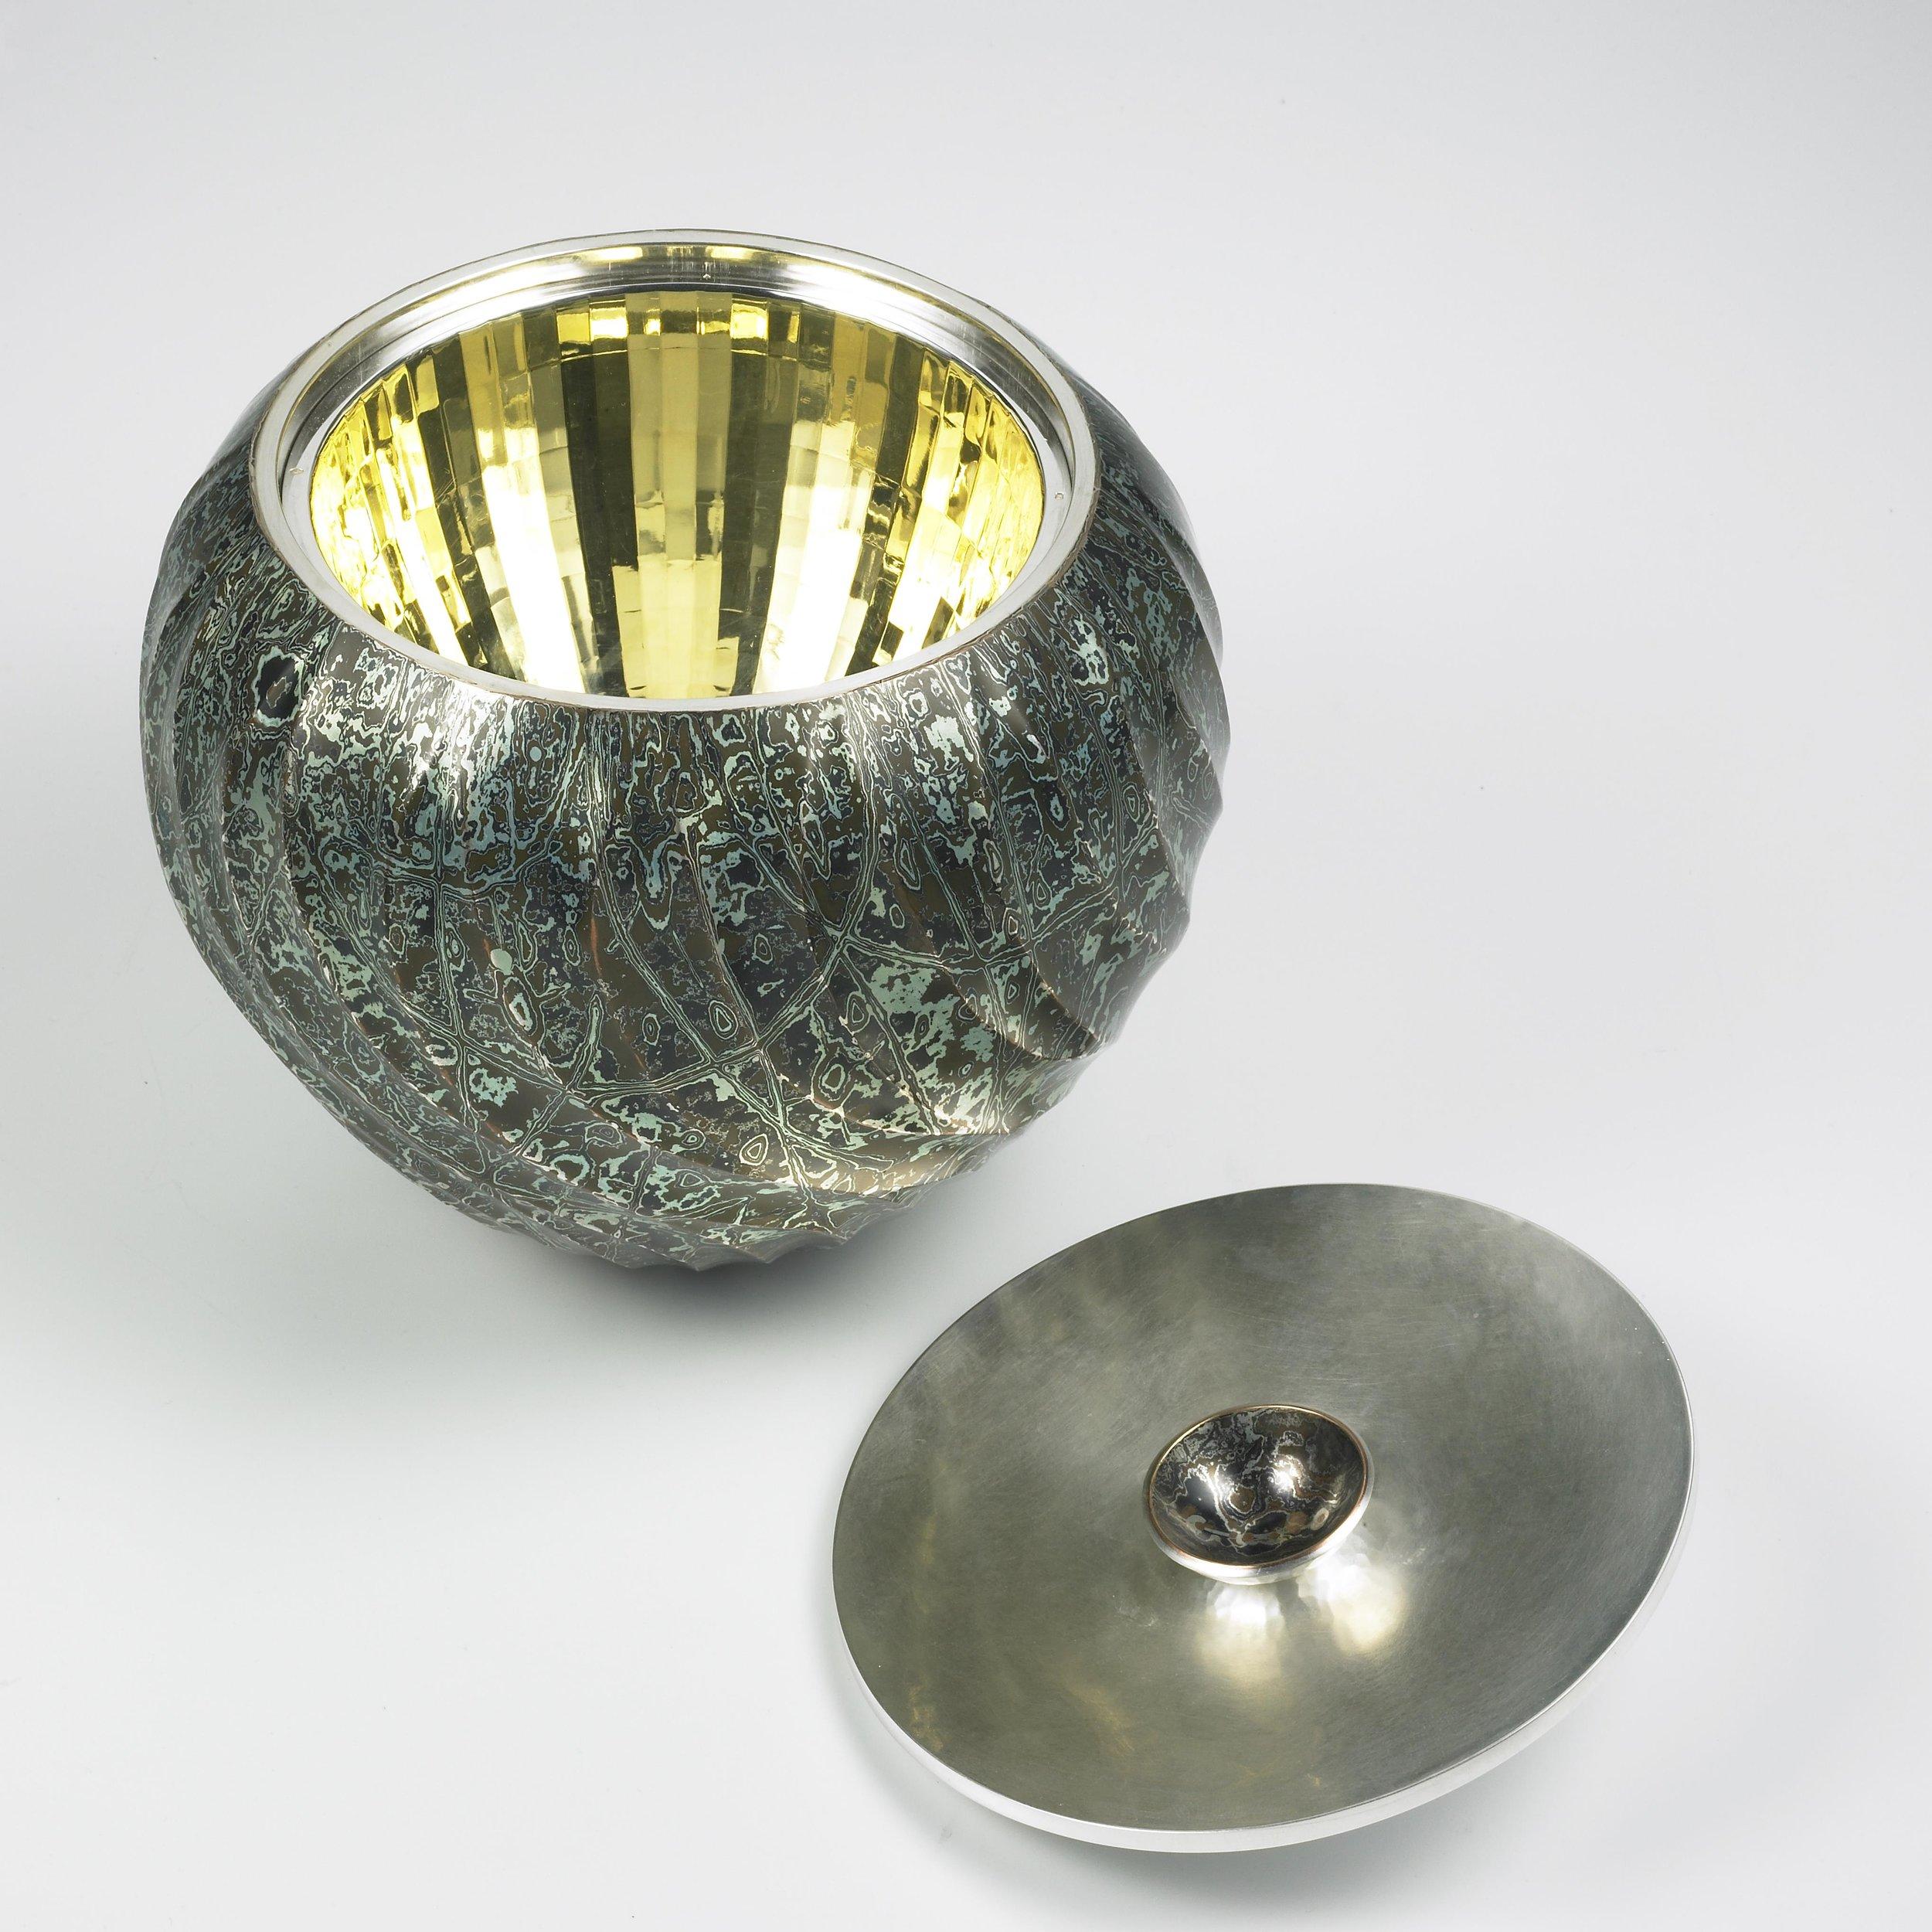 2011-SBDA-Hollowware-1st Place (Grand Prize)-Wayne Meeten-2_lg.jpg